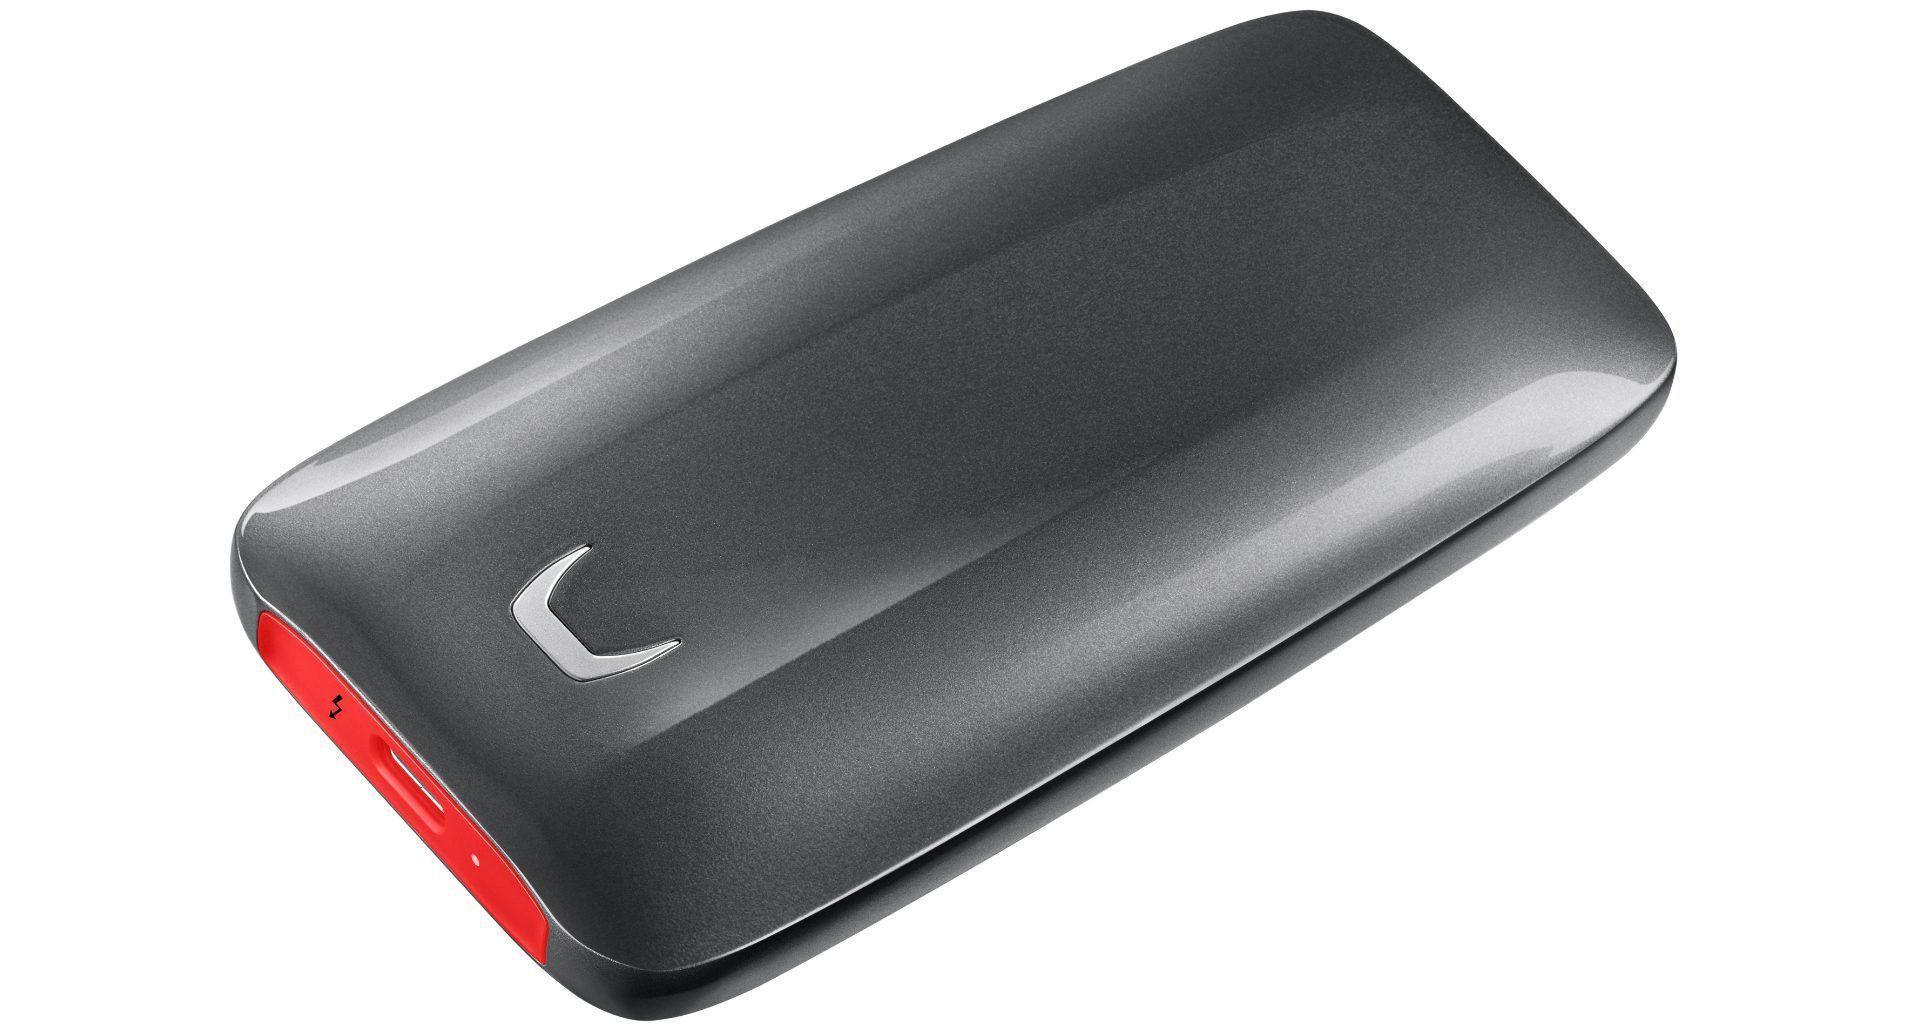 Samsung X5 2Tb External Thunderbolt 3 SSD Samsung